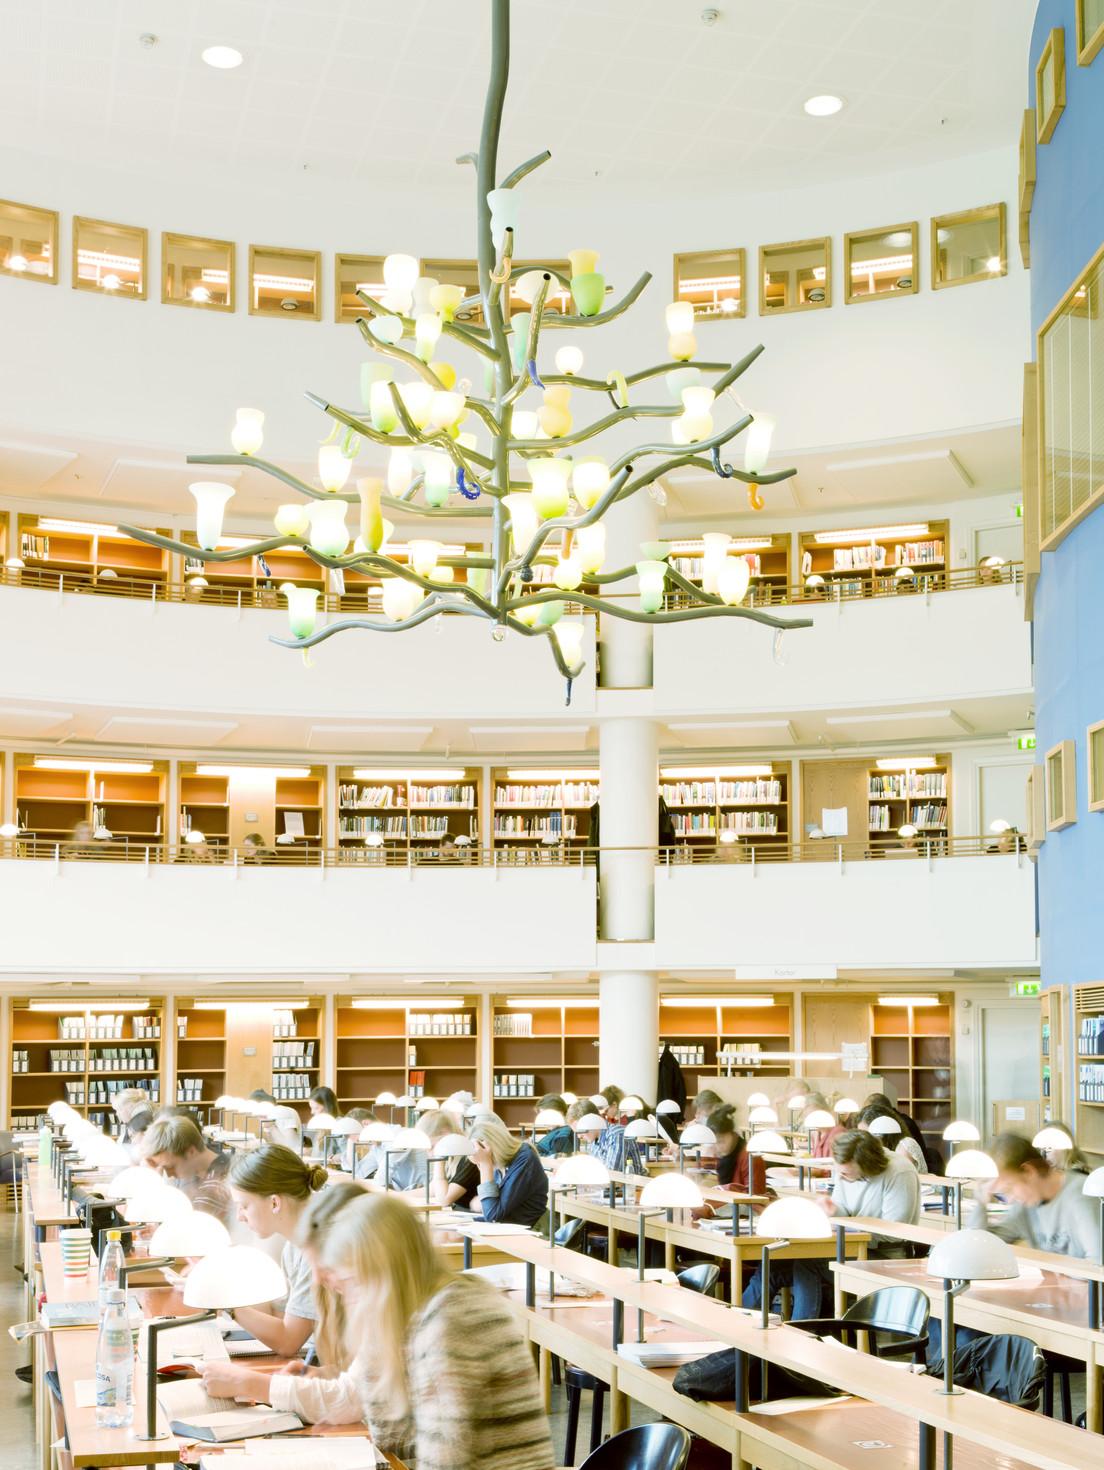 Handelshögskolan i Göteborg